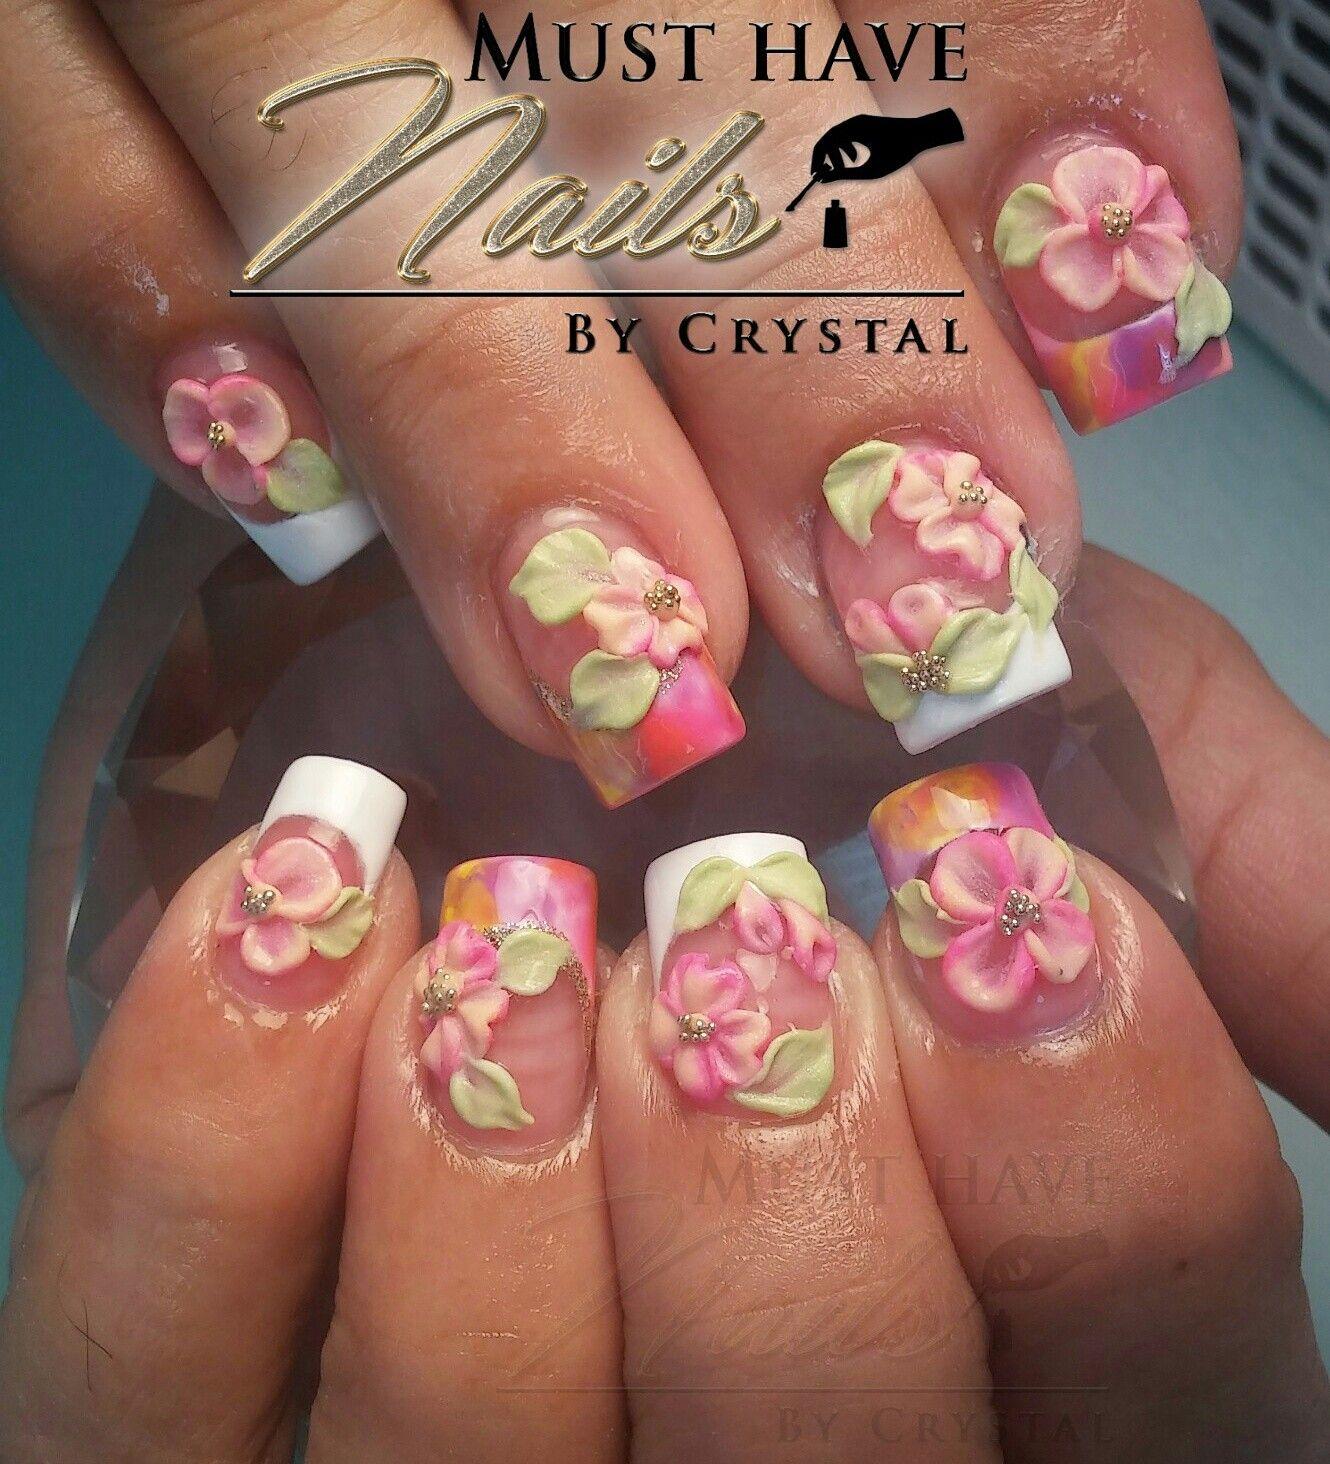 3d nail art | Must Have Nails By Crystal Morales | Pinterest